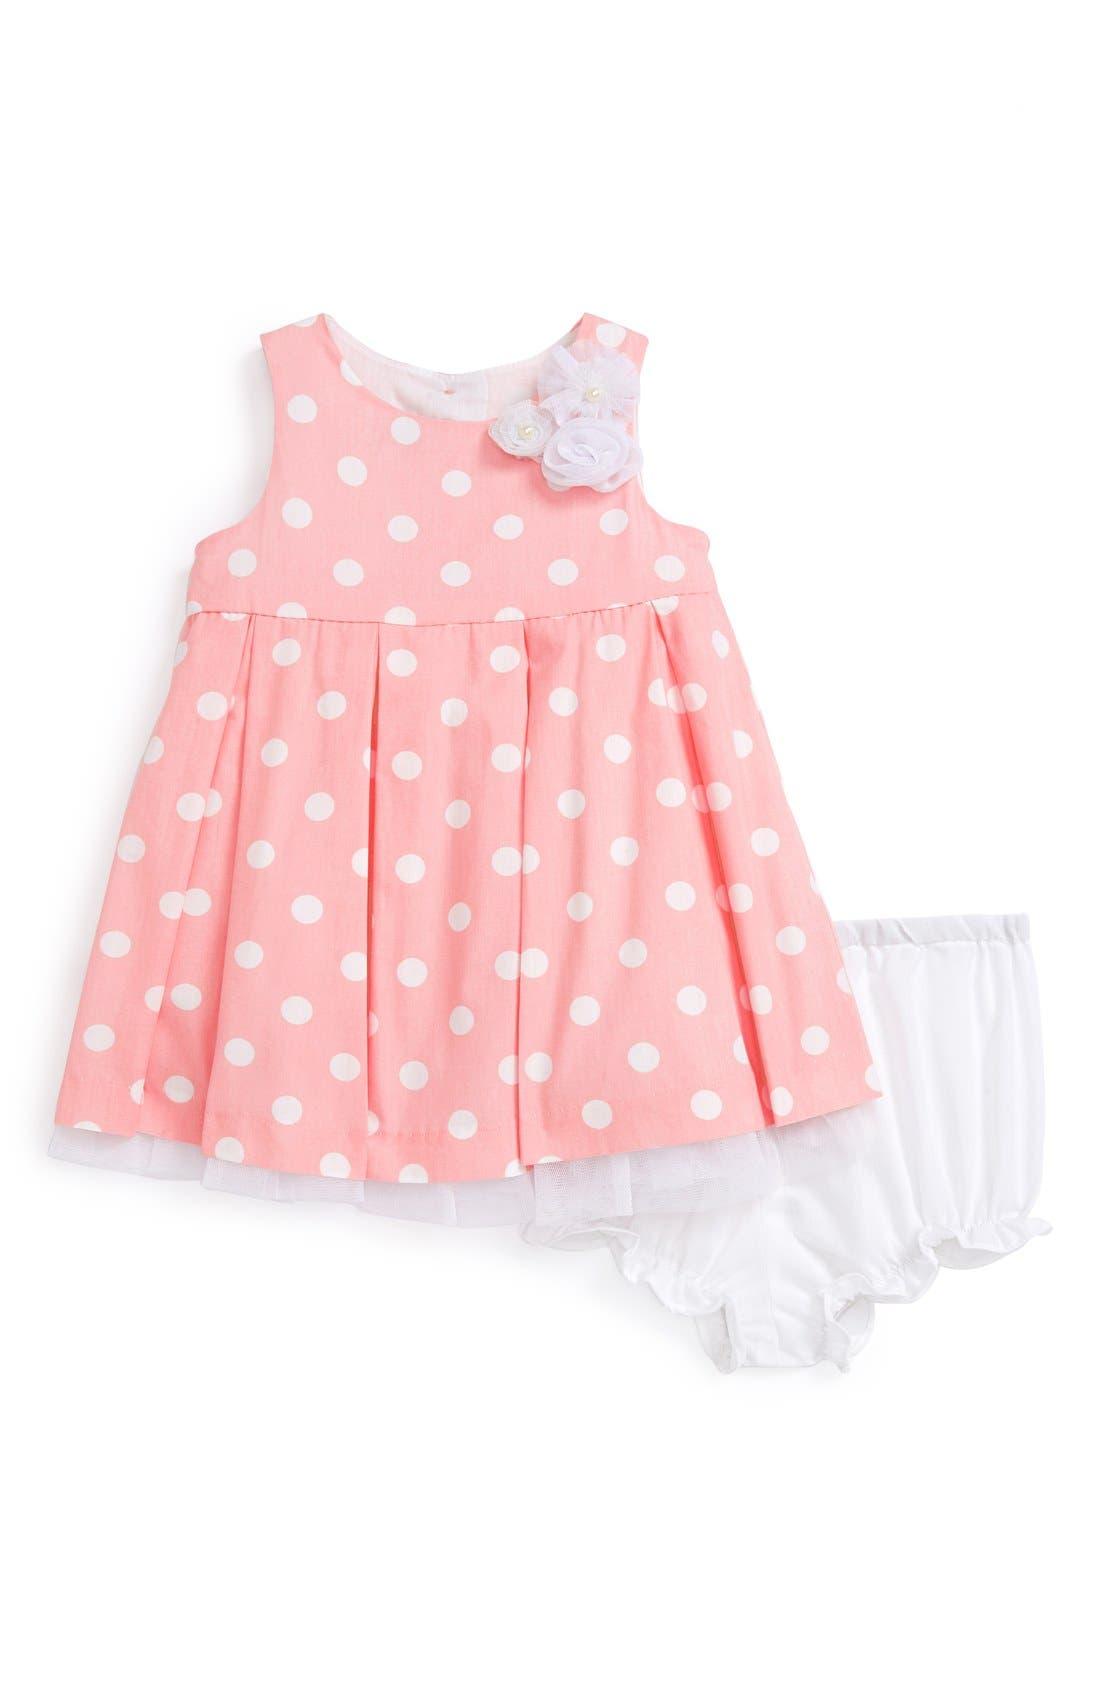 Alternate Image 1 Selected - Pippa & Julie Polka Dot Dress & Bloomers (Baby Girl)